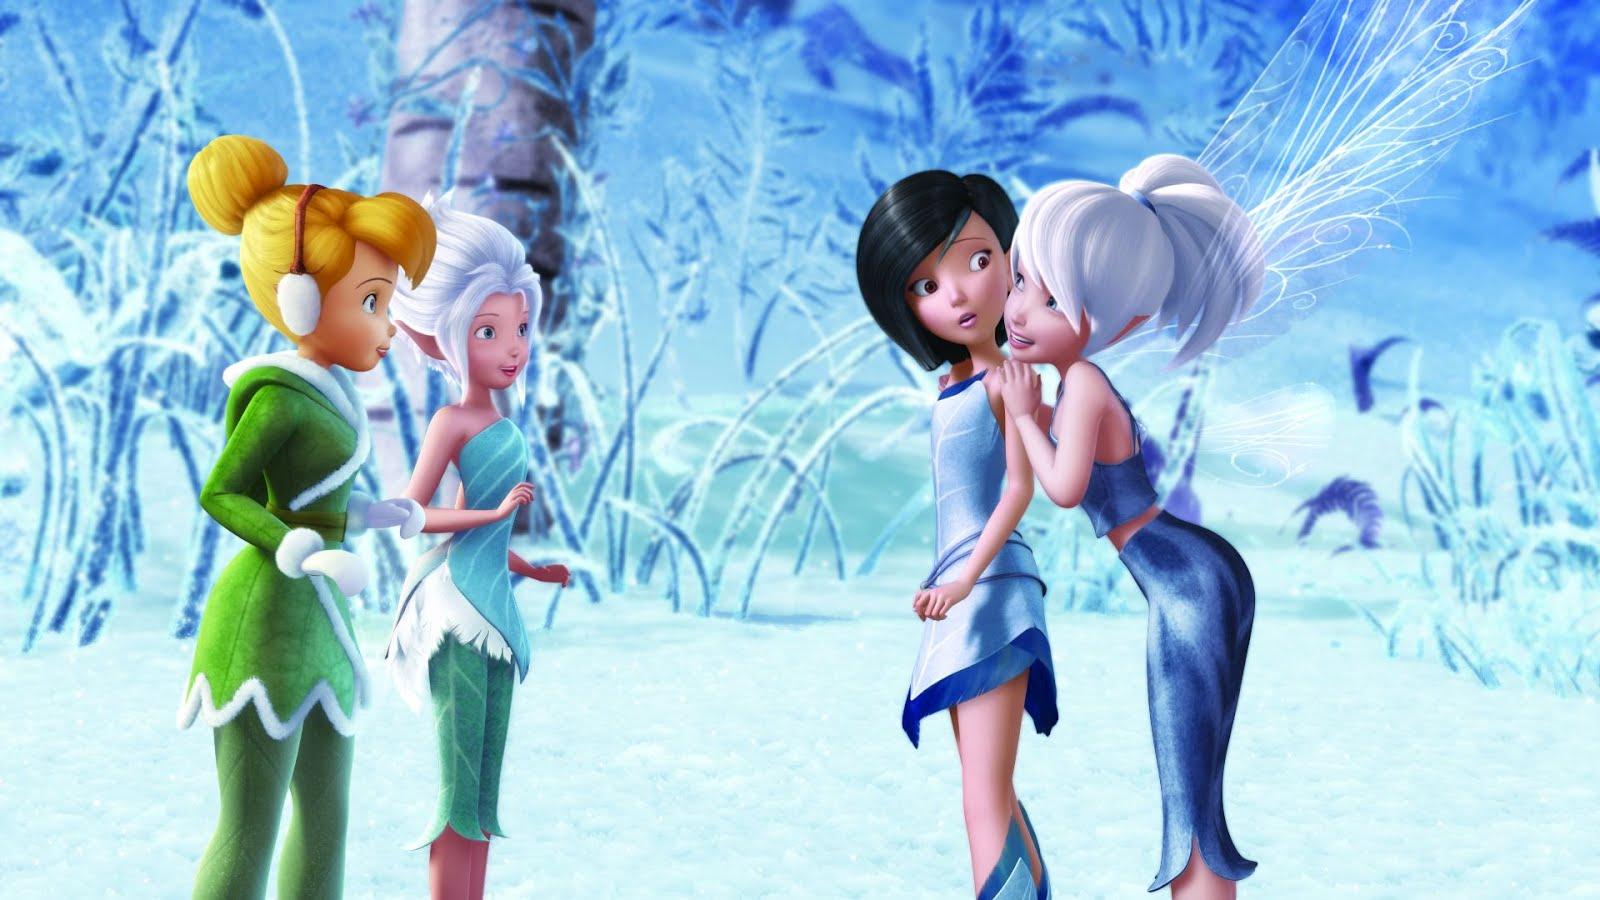 Tinker bell periwinkle gliss spike.jpg  sc 1 st  Disney Fairies Wiki - Fandom & Image - Tinker bell periwinkle gliss spike.jpg | Disney Fairies Wiki ...